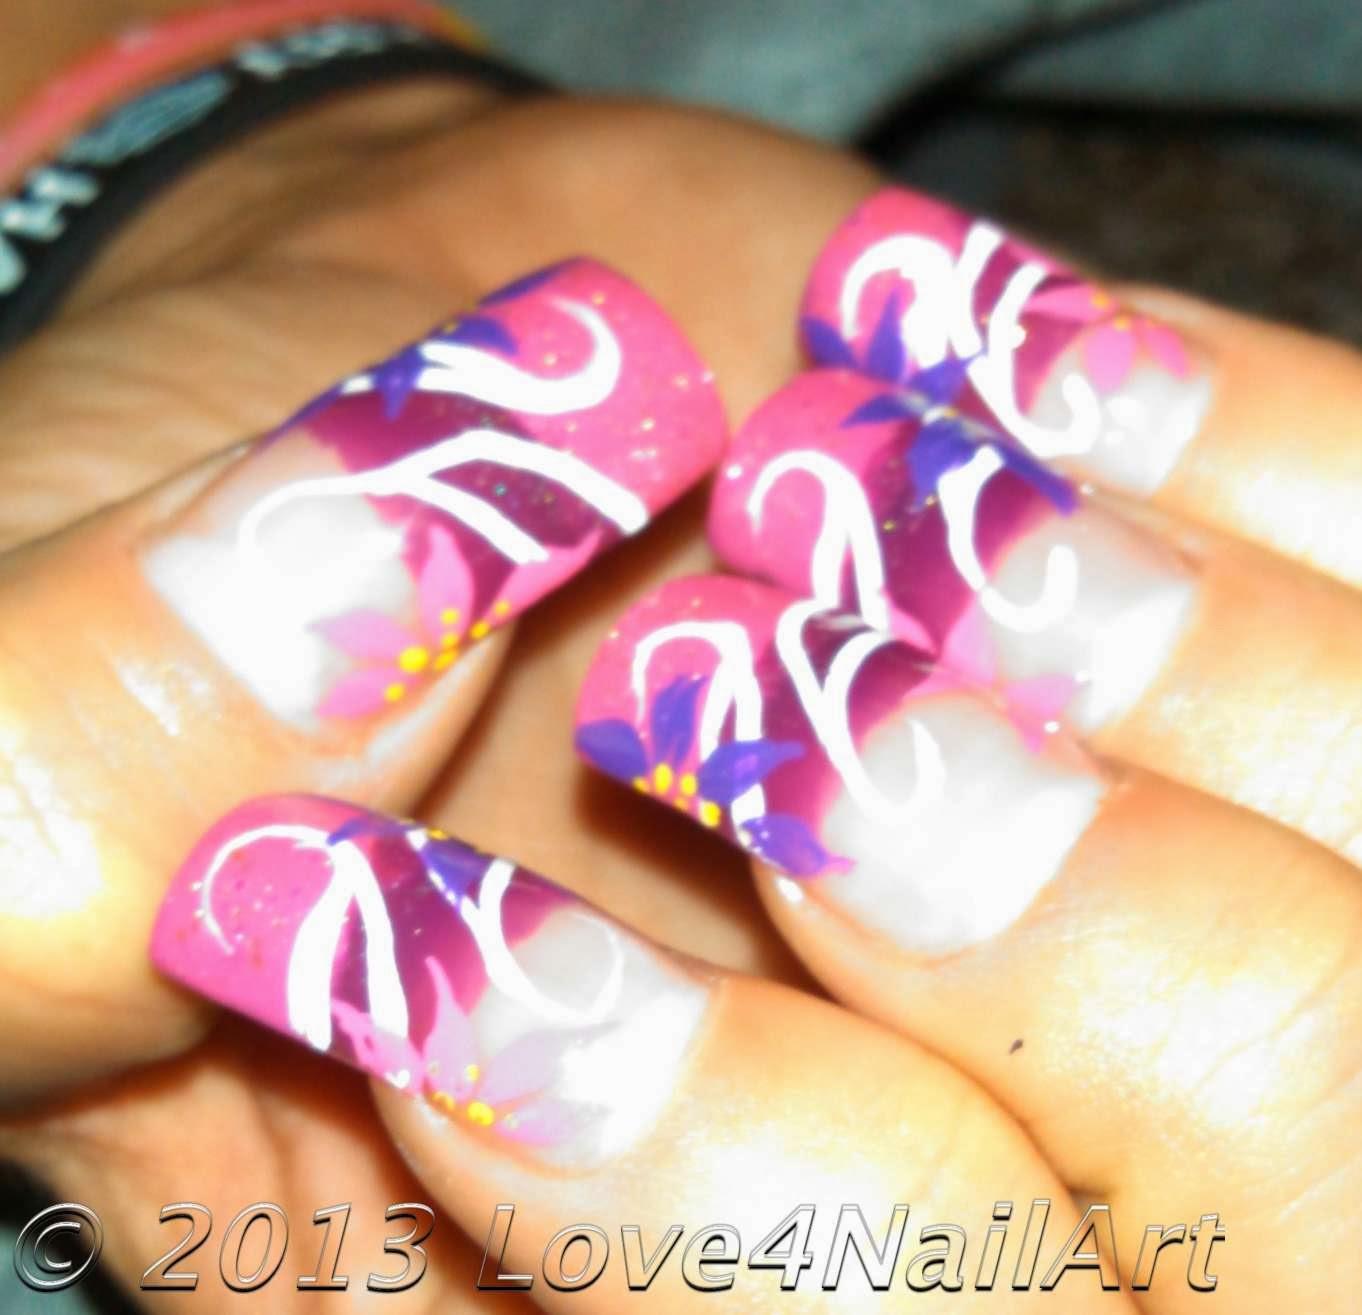 Girly Nail Art: Love4NailArt: Groovy Girly Flower Nail Art Design